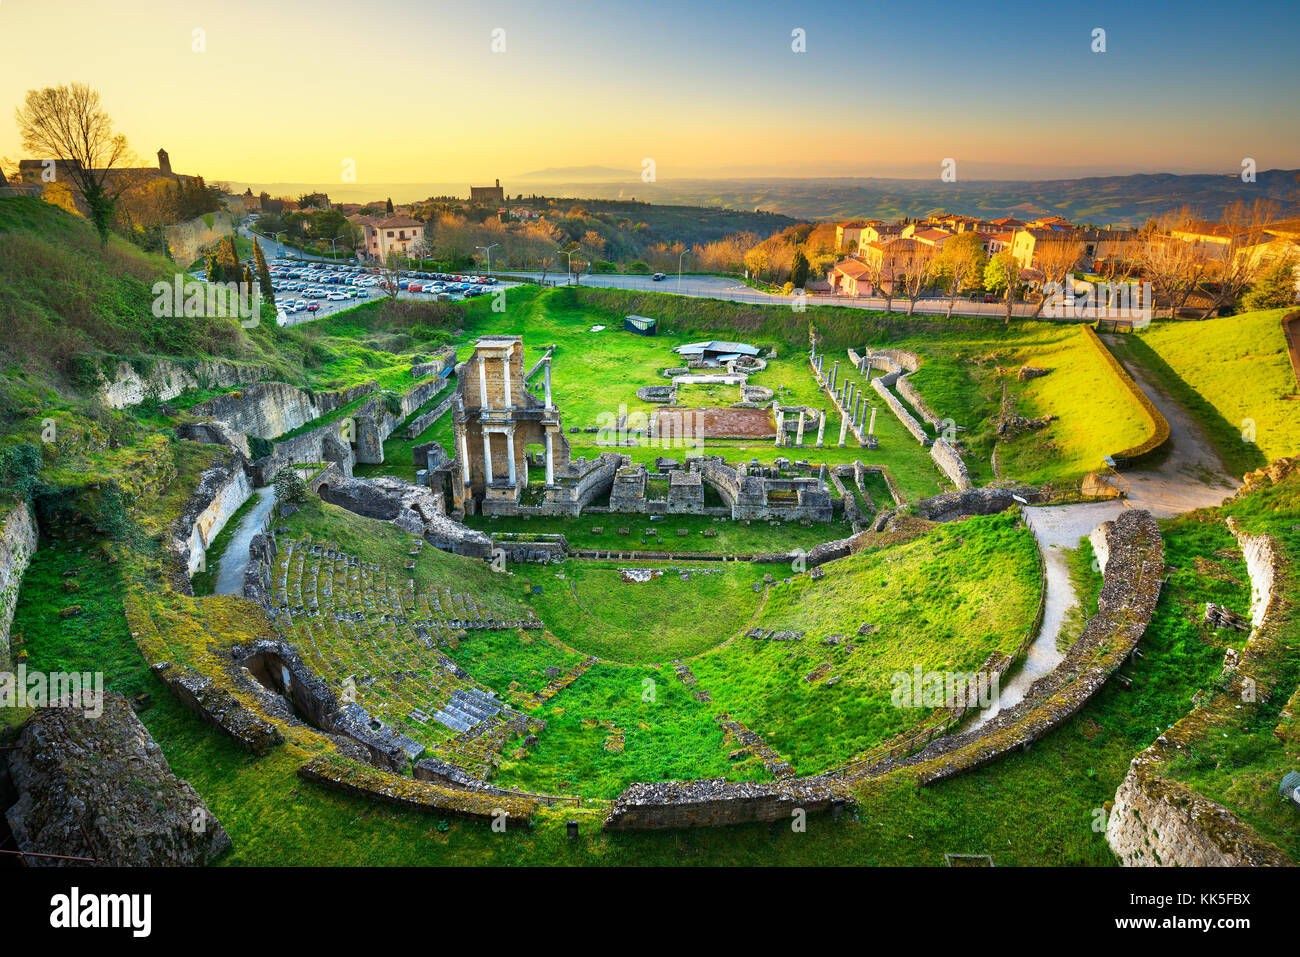 Volterra roman theatre ruins at sunset 1st century bce tuscany volterra roman theatre ruins at sunset 1st century bce tuscany italy europe publicscrutiny Images